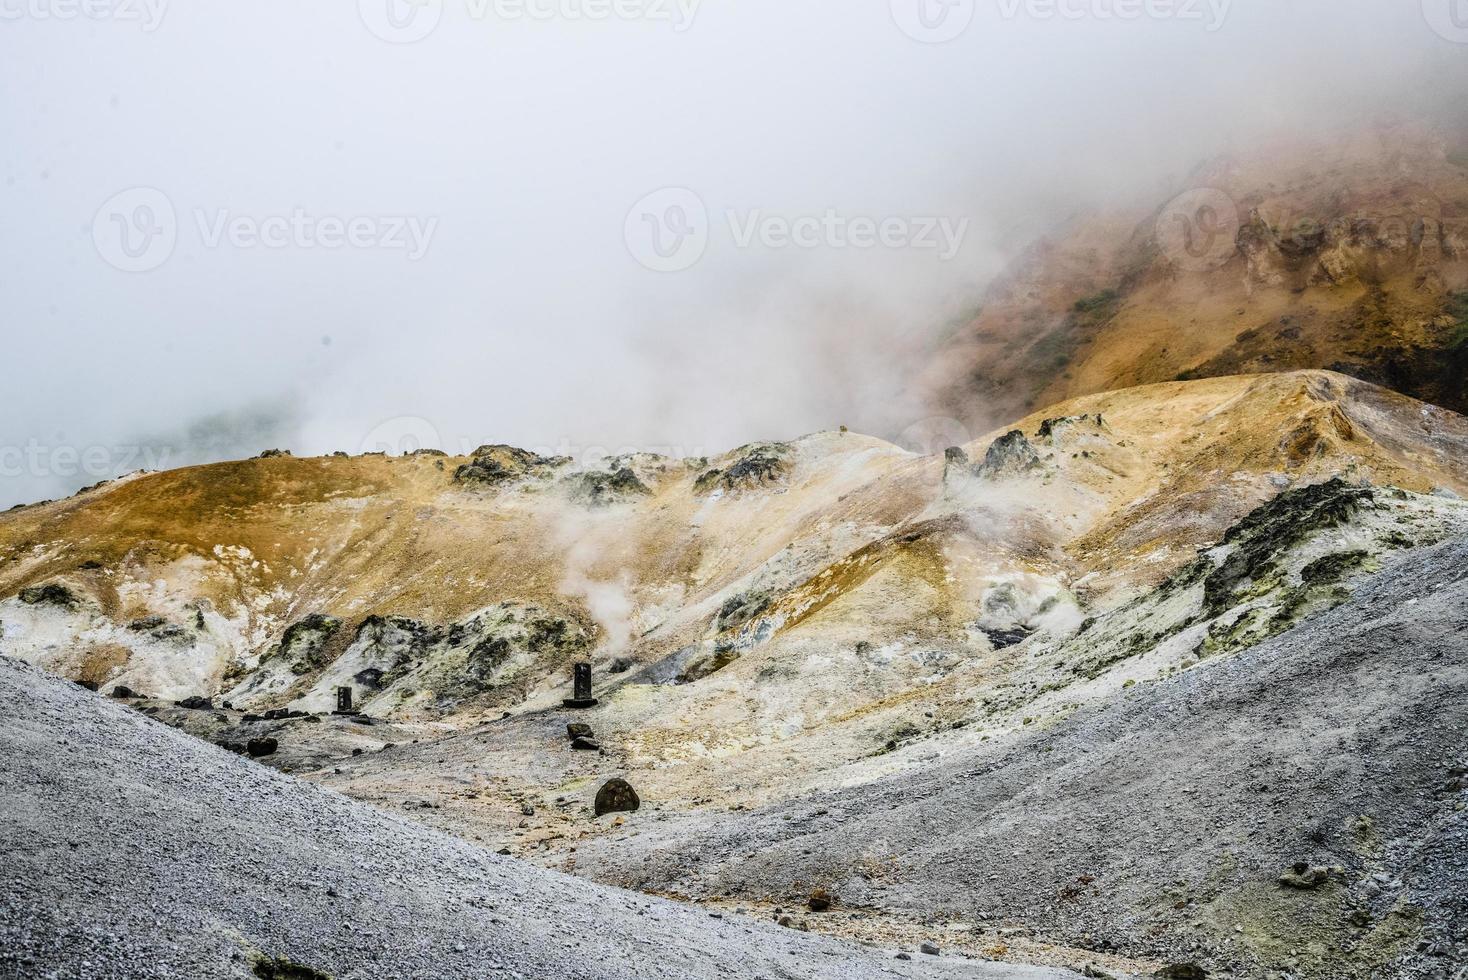 montagna dell'inferno jigokudani in noboribetsu giappone10 foto